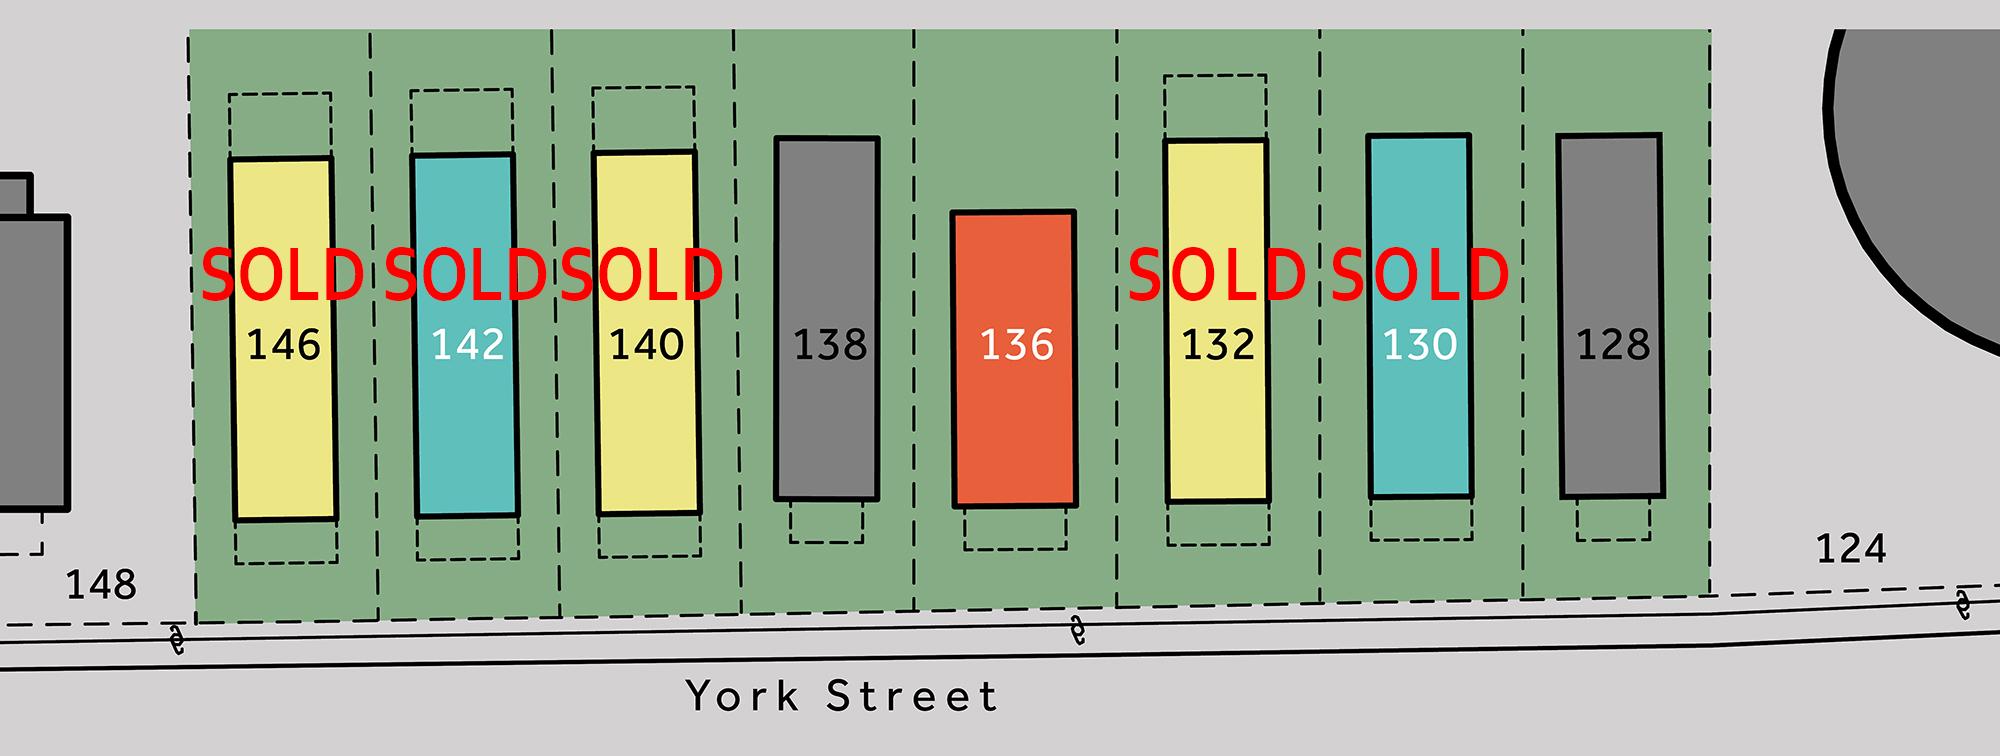 128-146 York Street